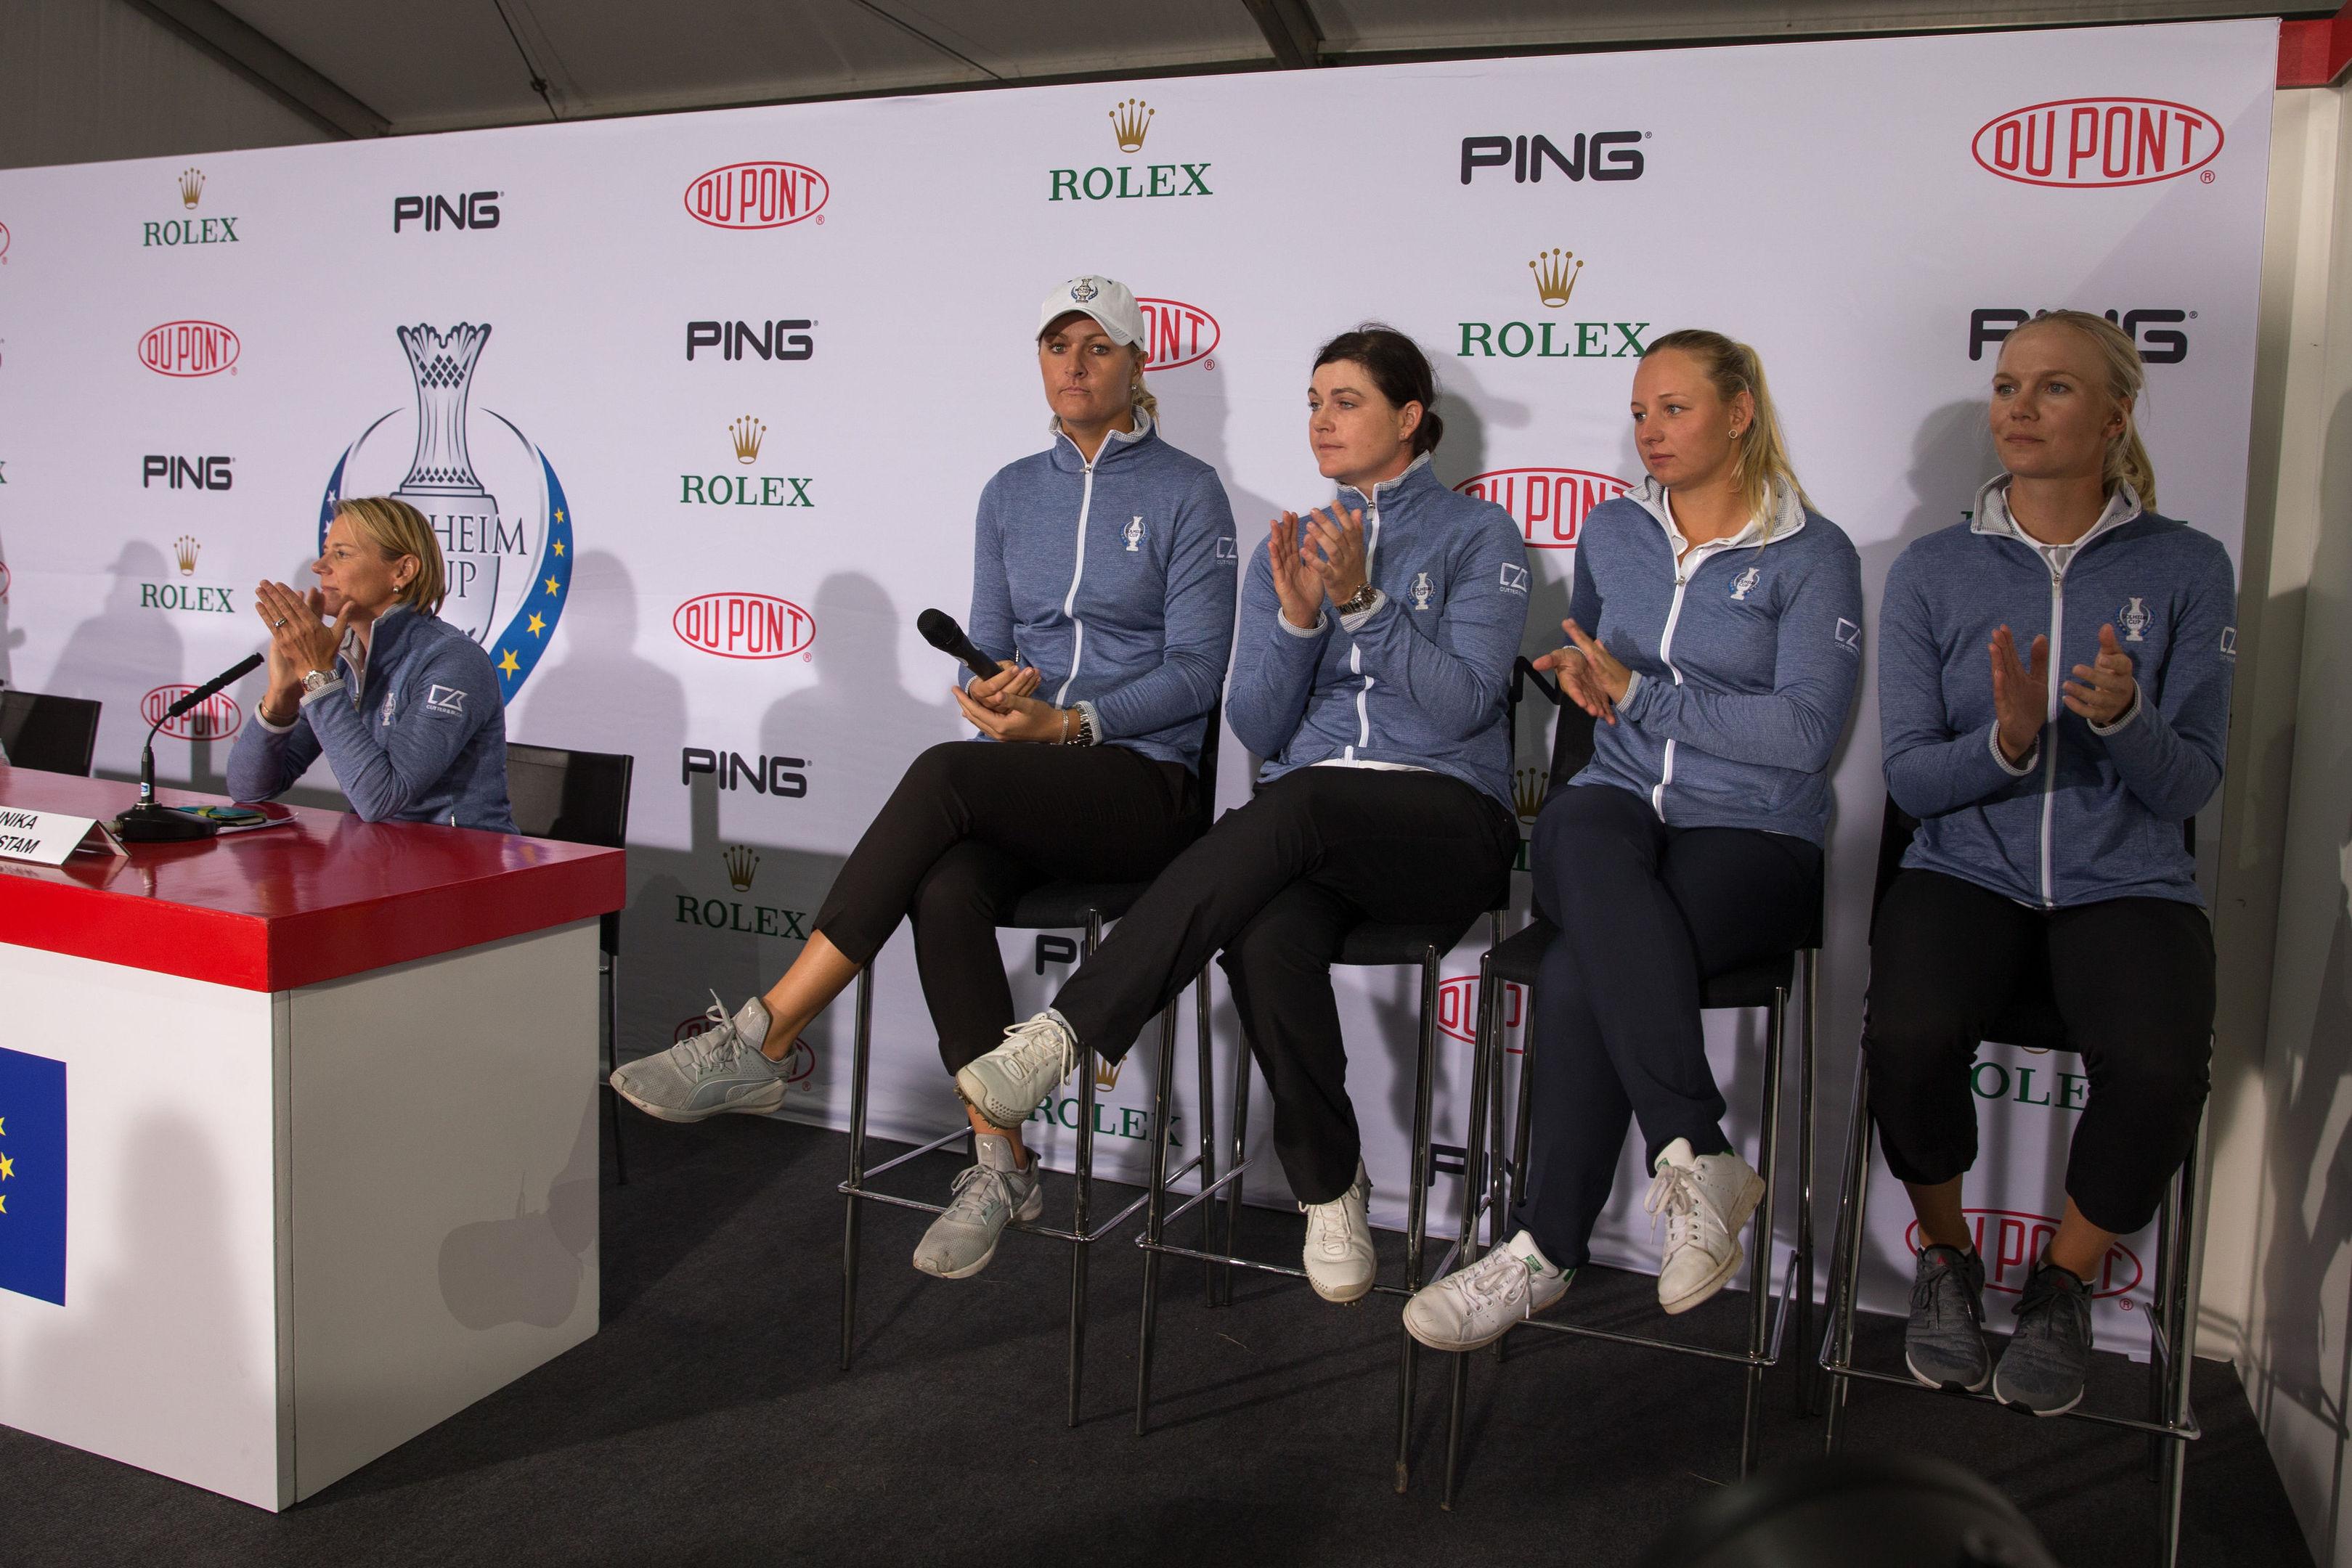 Annika Sorenstam announces her 4 wildcard picks, Anna Nordqvist, Caroline Masson, Emily Pedersen and Madelene Sagstrom.